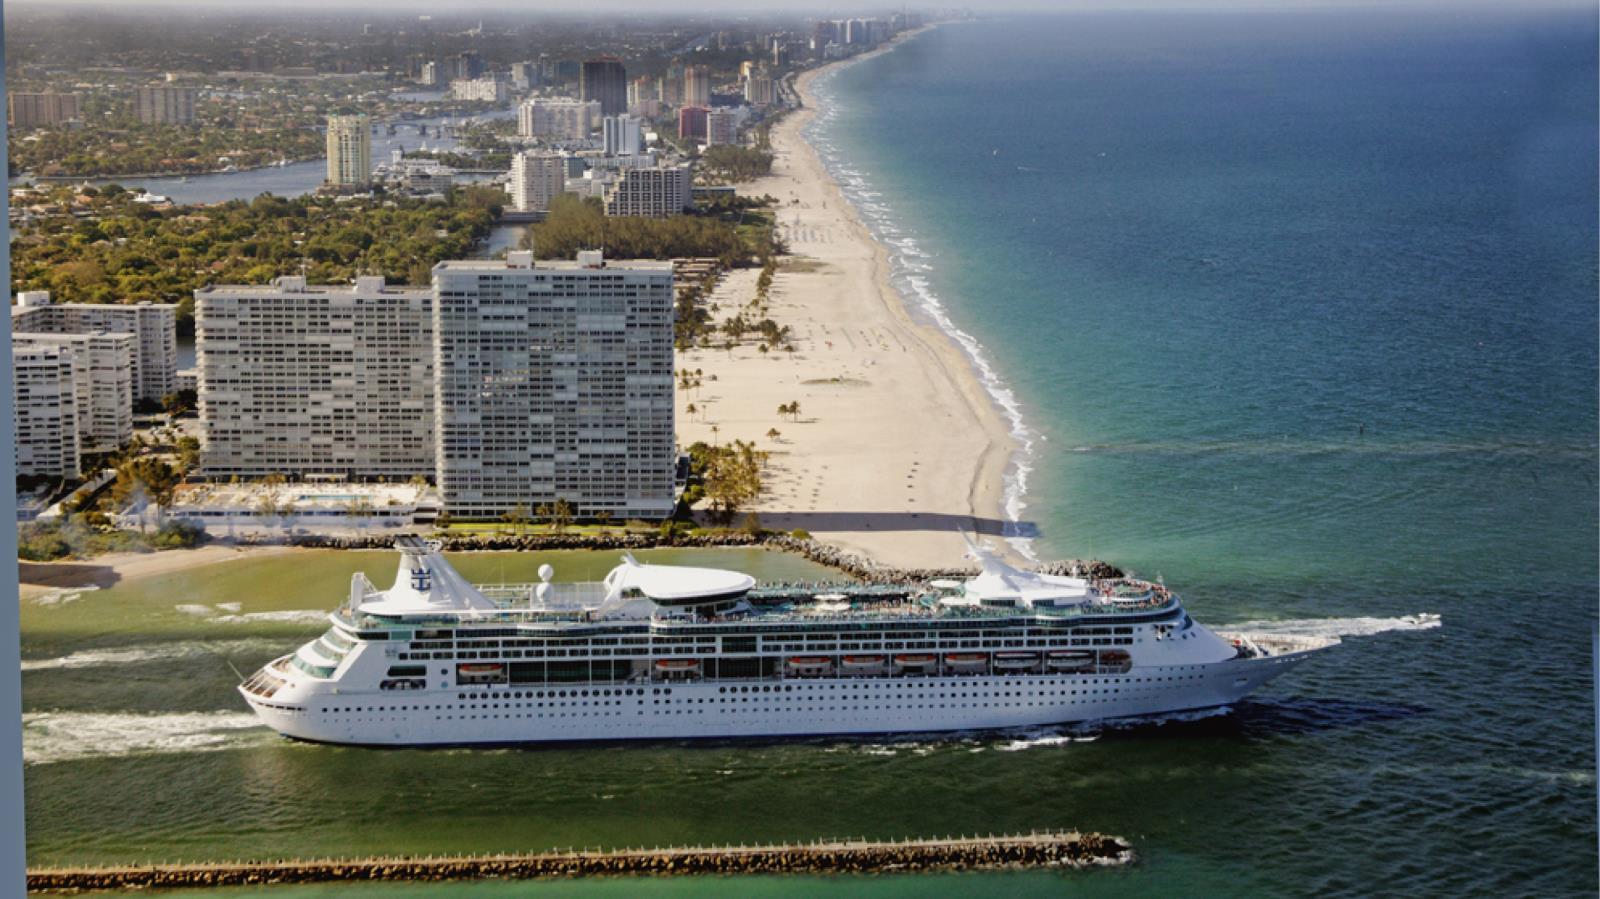 Visitors City Of Fort Lauderdale Fl